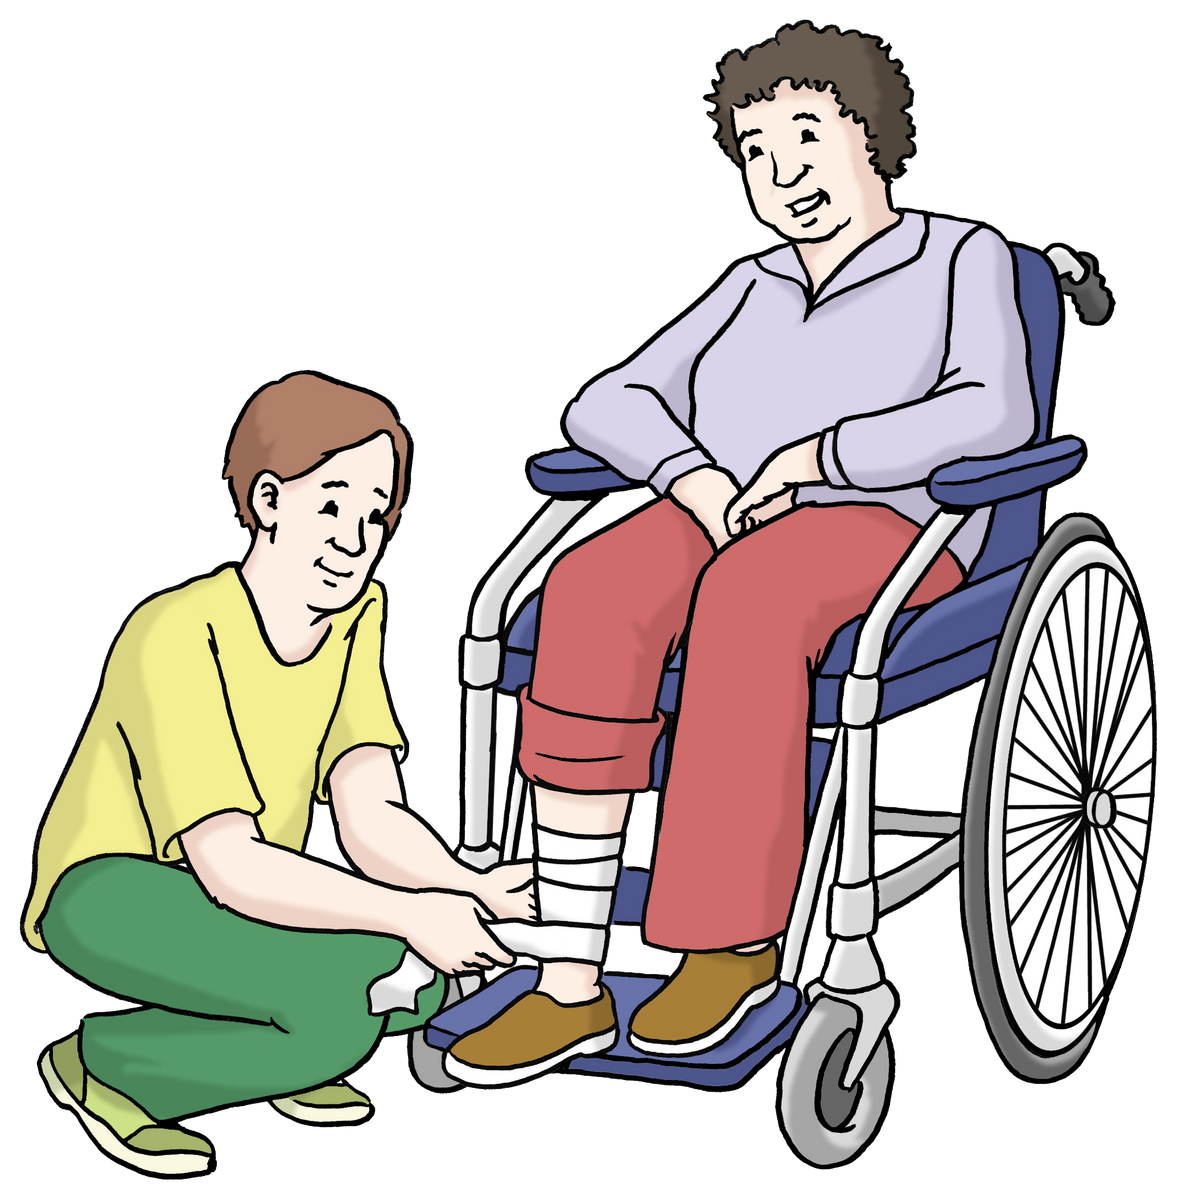 Pfleger hilft Mensch im Rollstuhl